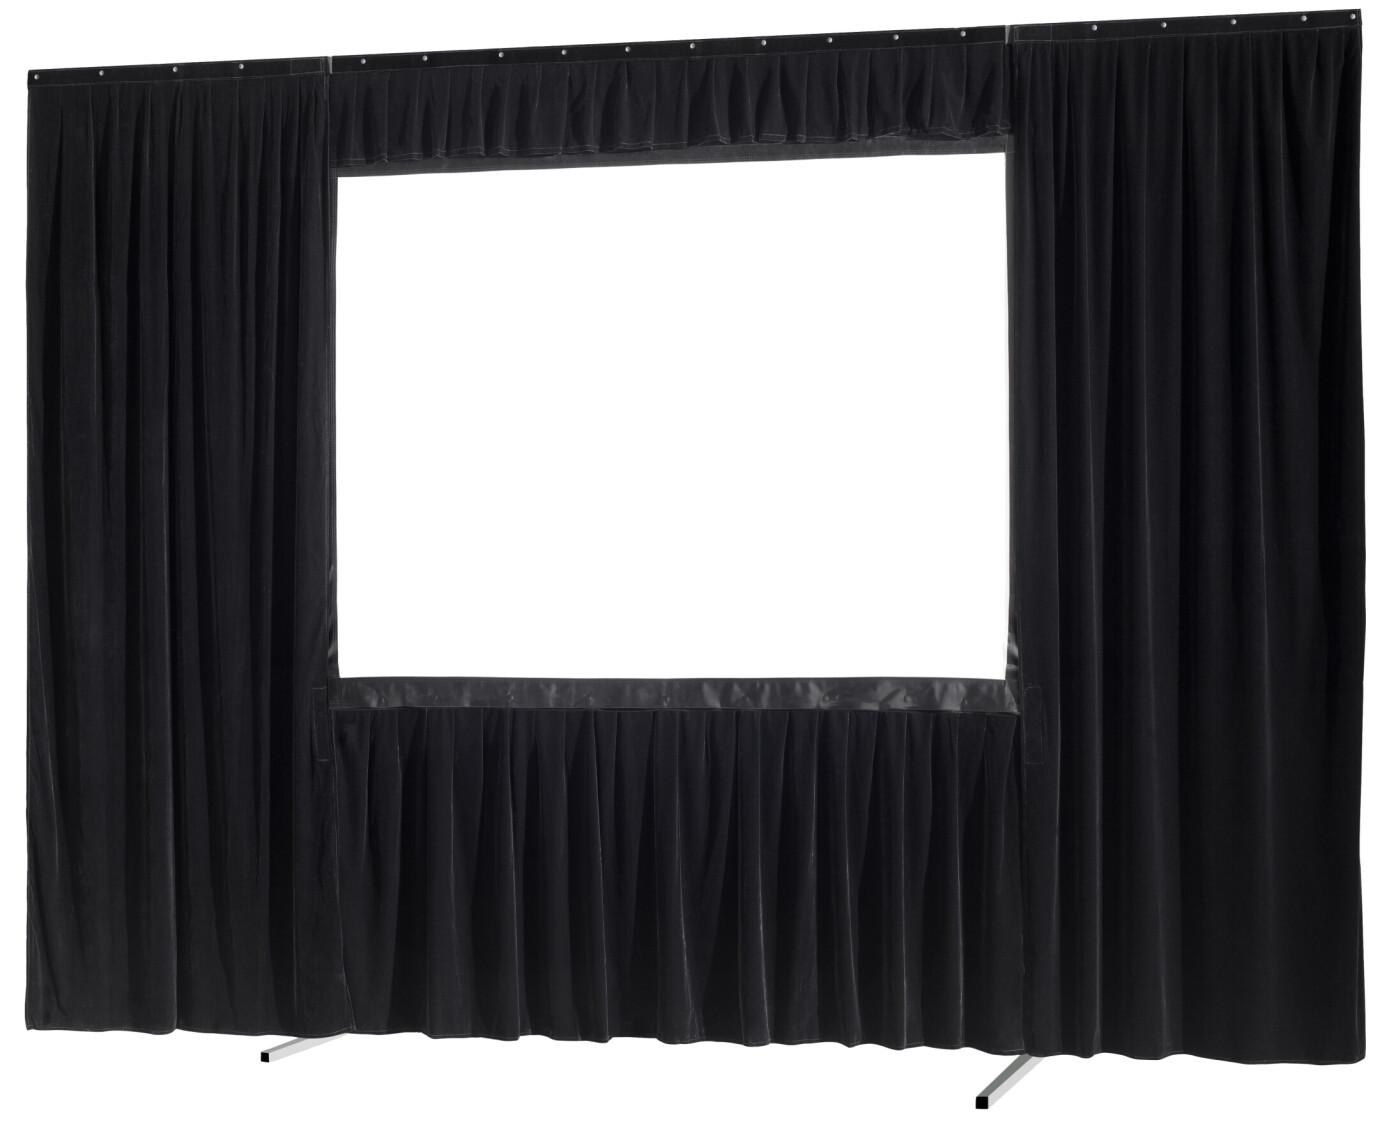 celexon 4-Piece Drape Surround for Folding Frame Mobile Expert - 366 x 274cm